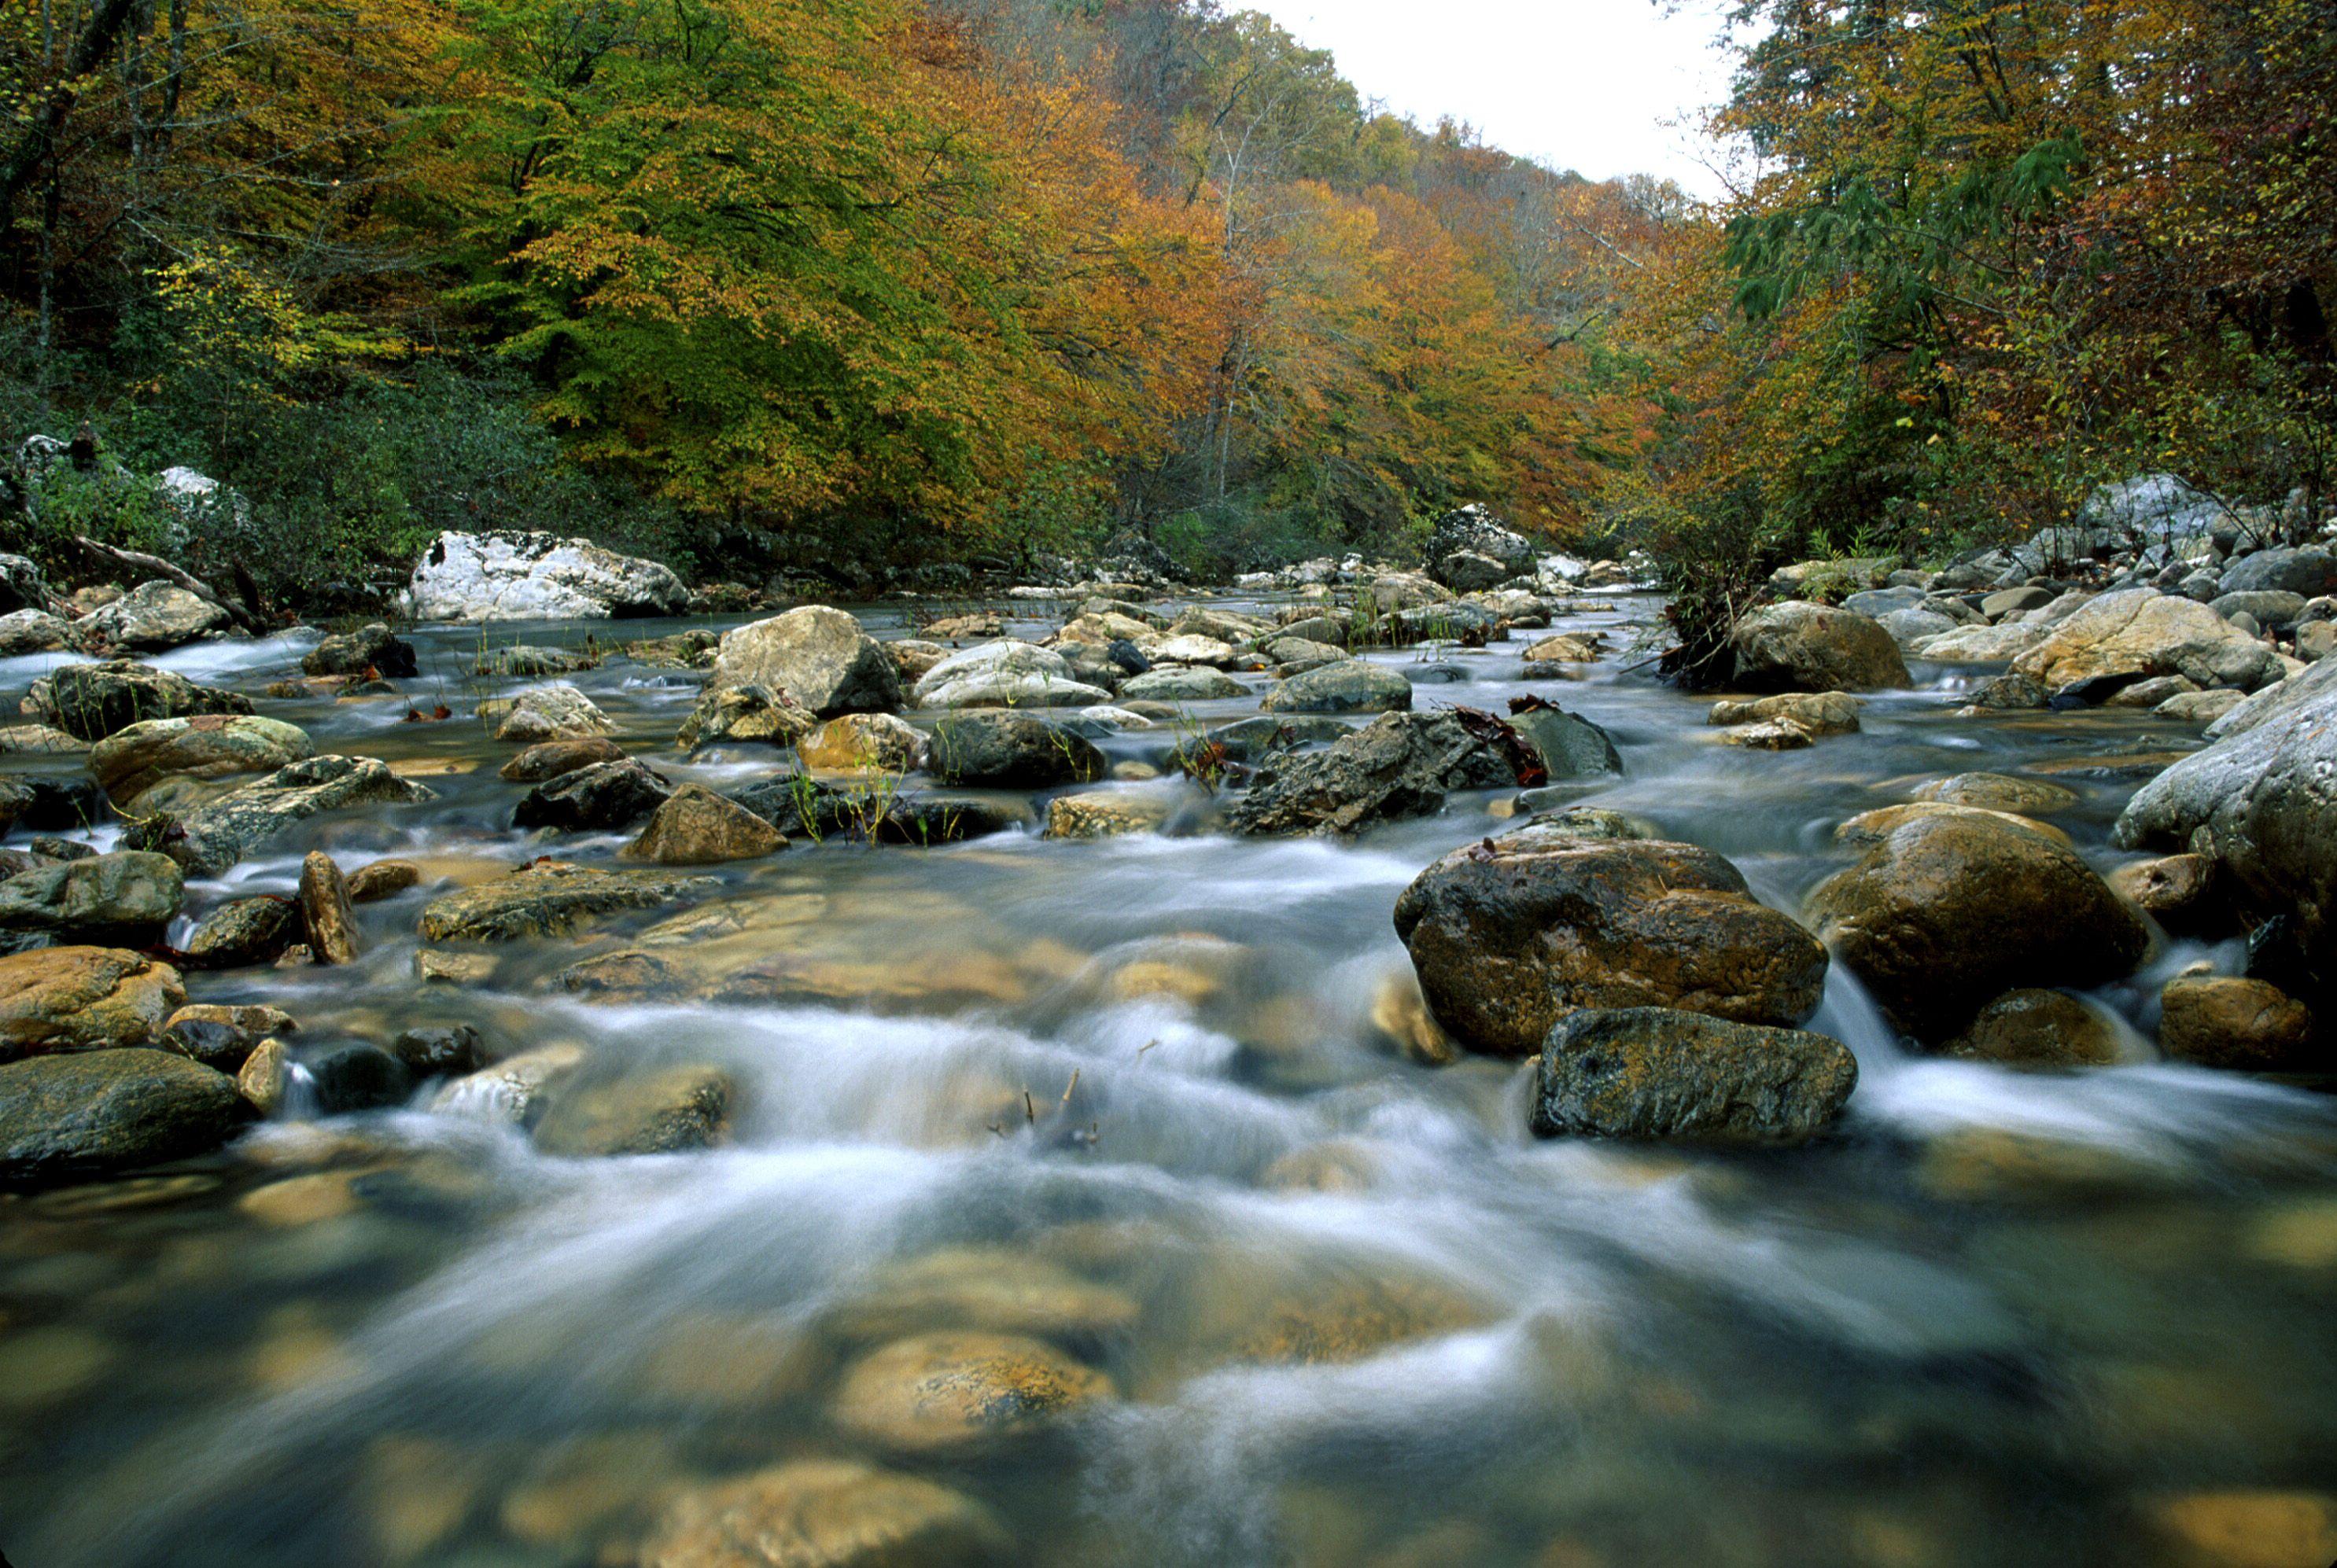 Ouachita National Forest in Arkansas